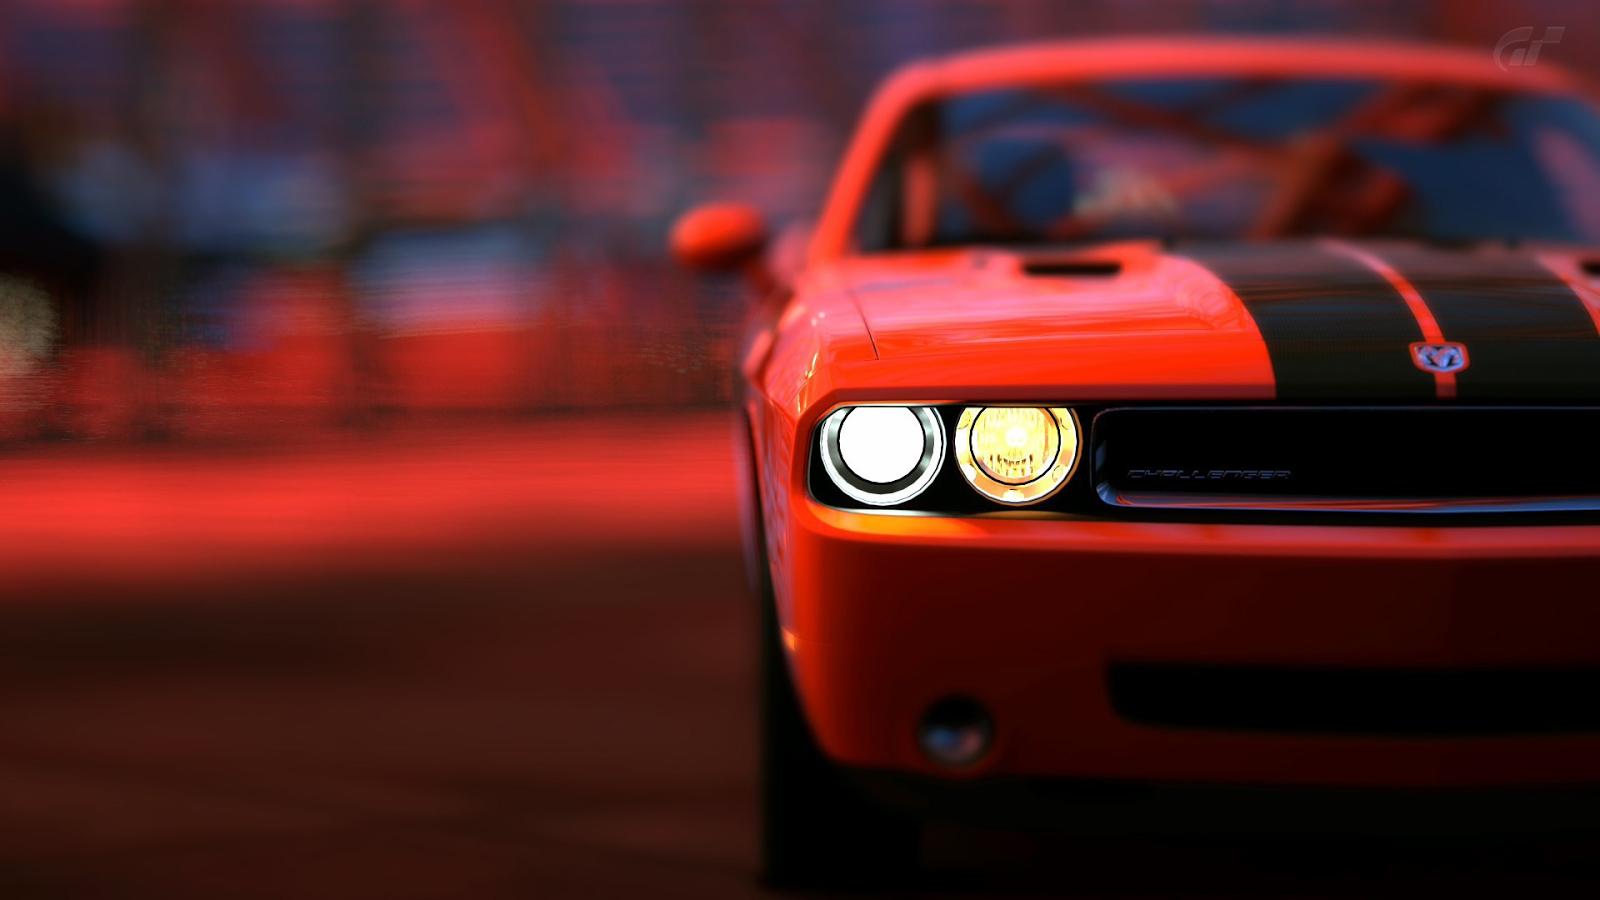 Dodge Challenger STR8 Car HD Desktop Wallpaper HD Desktop Wallpapers 1600x900